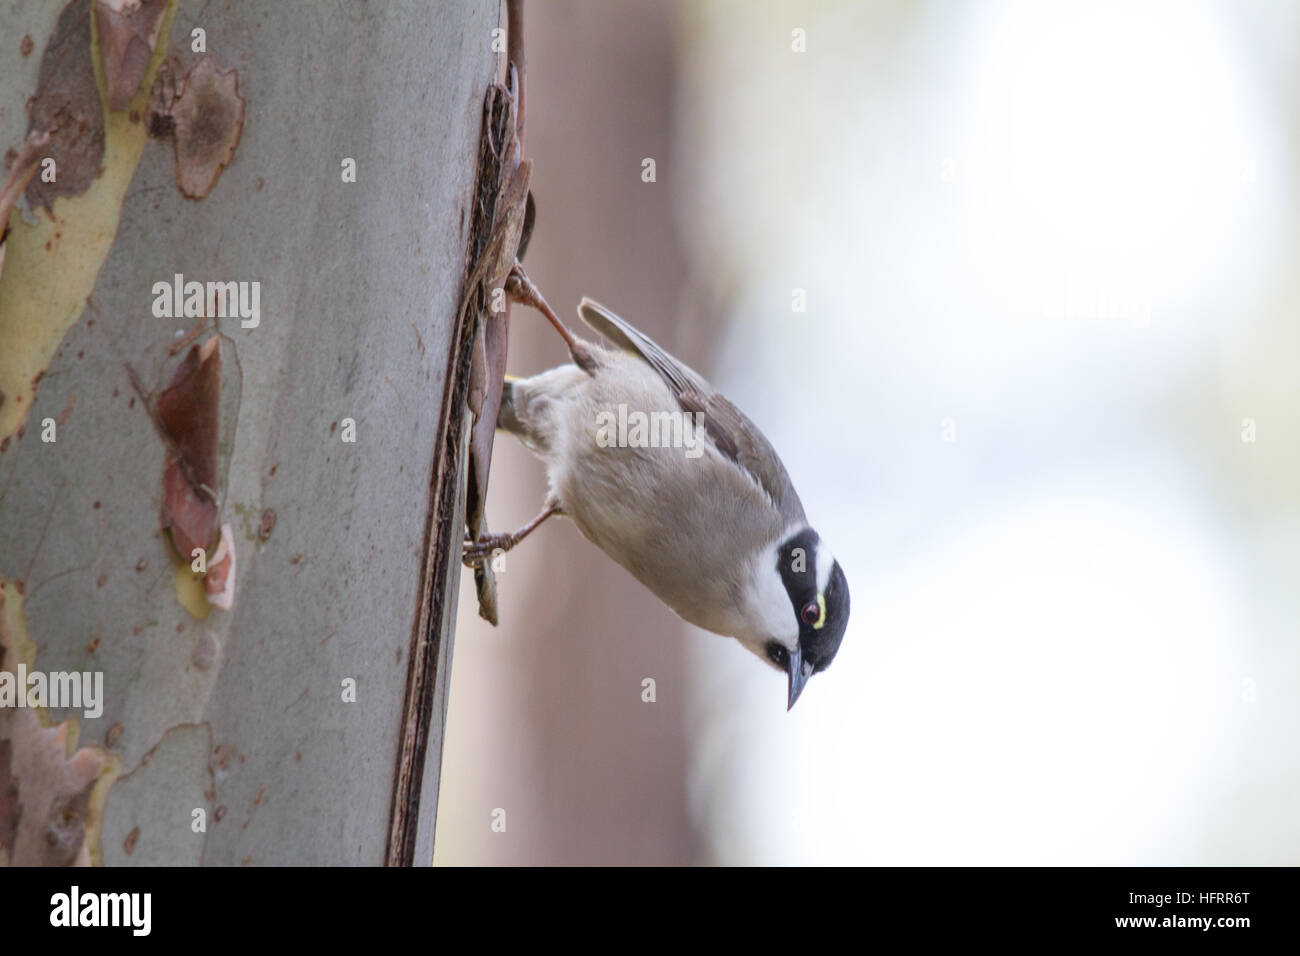 Strong-billed Honeyeater (Melithreptus validirostris) - Stock Image